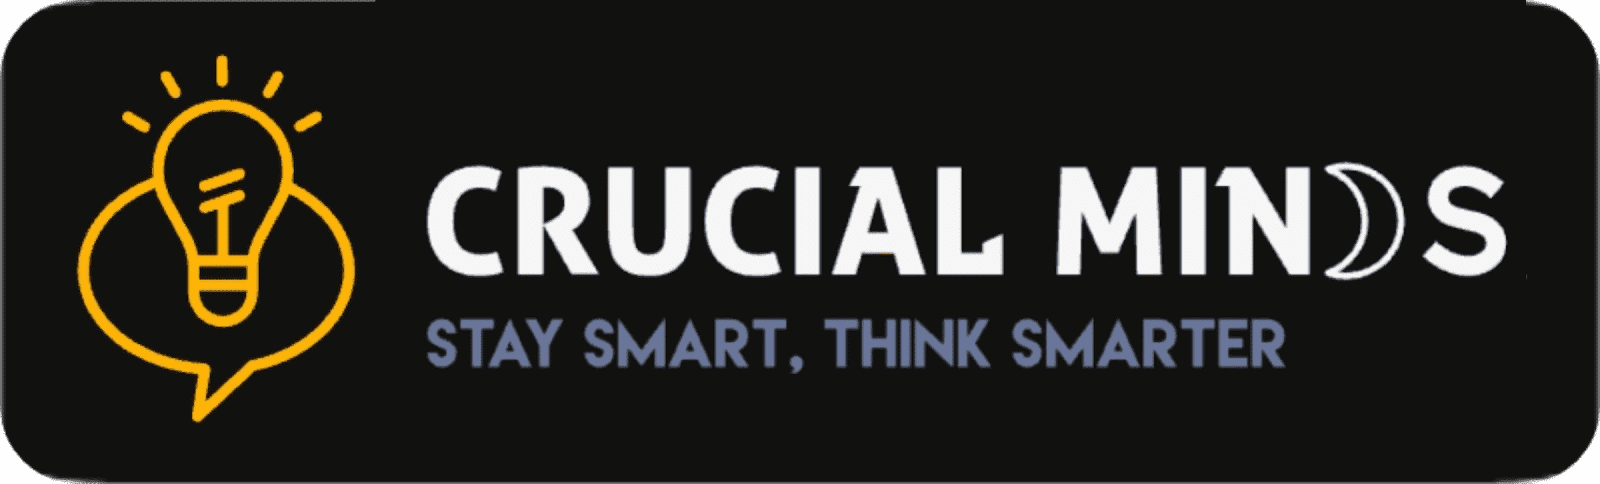 Crucial Minds